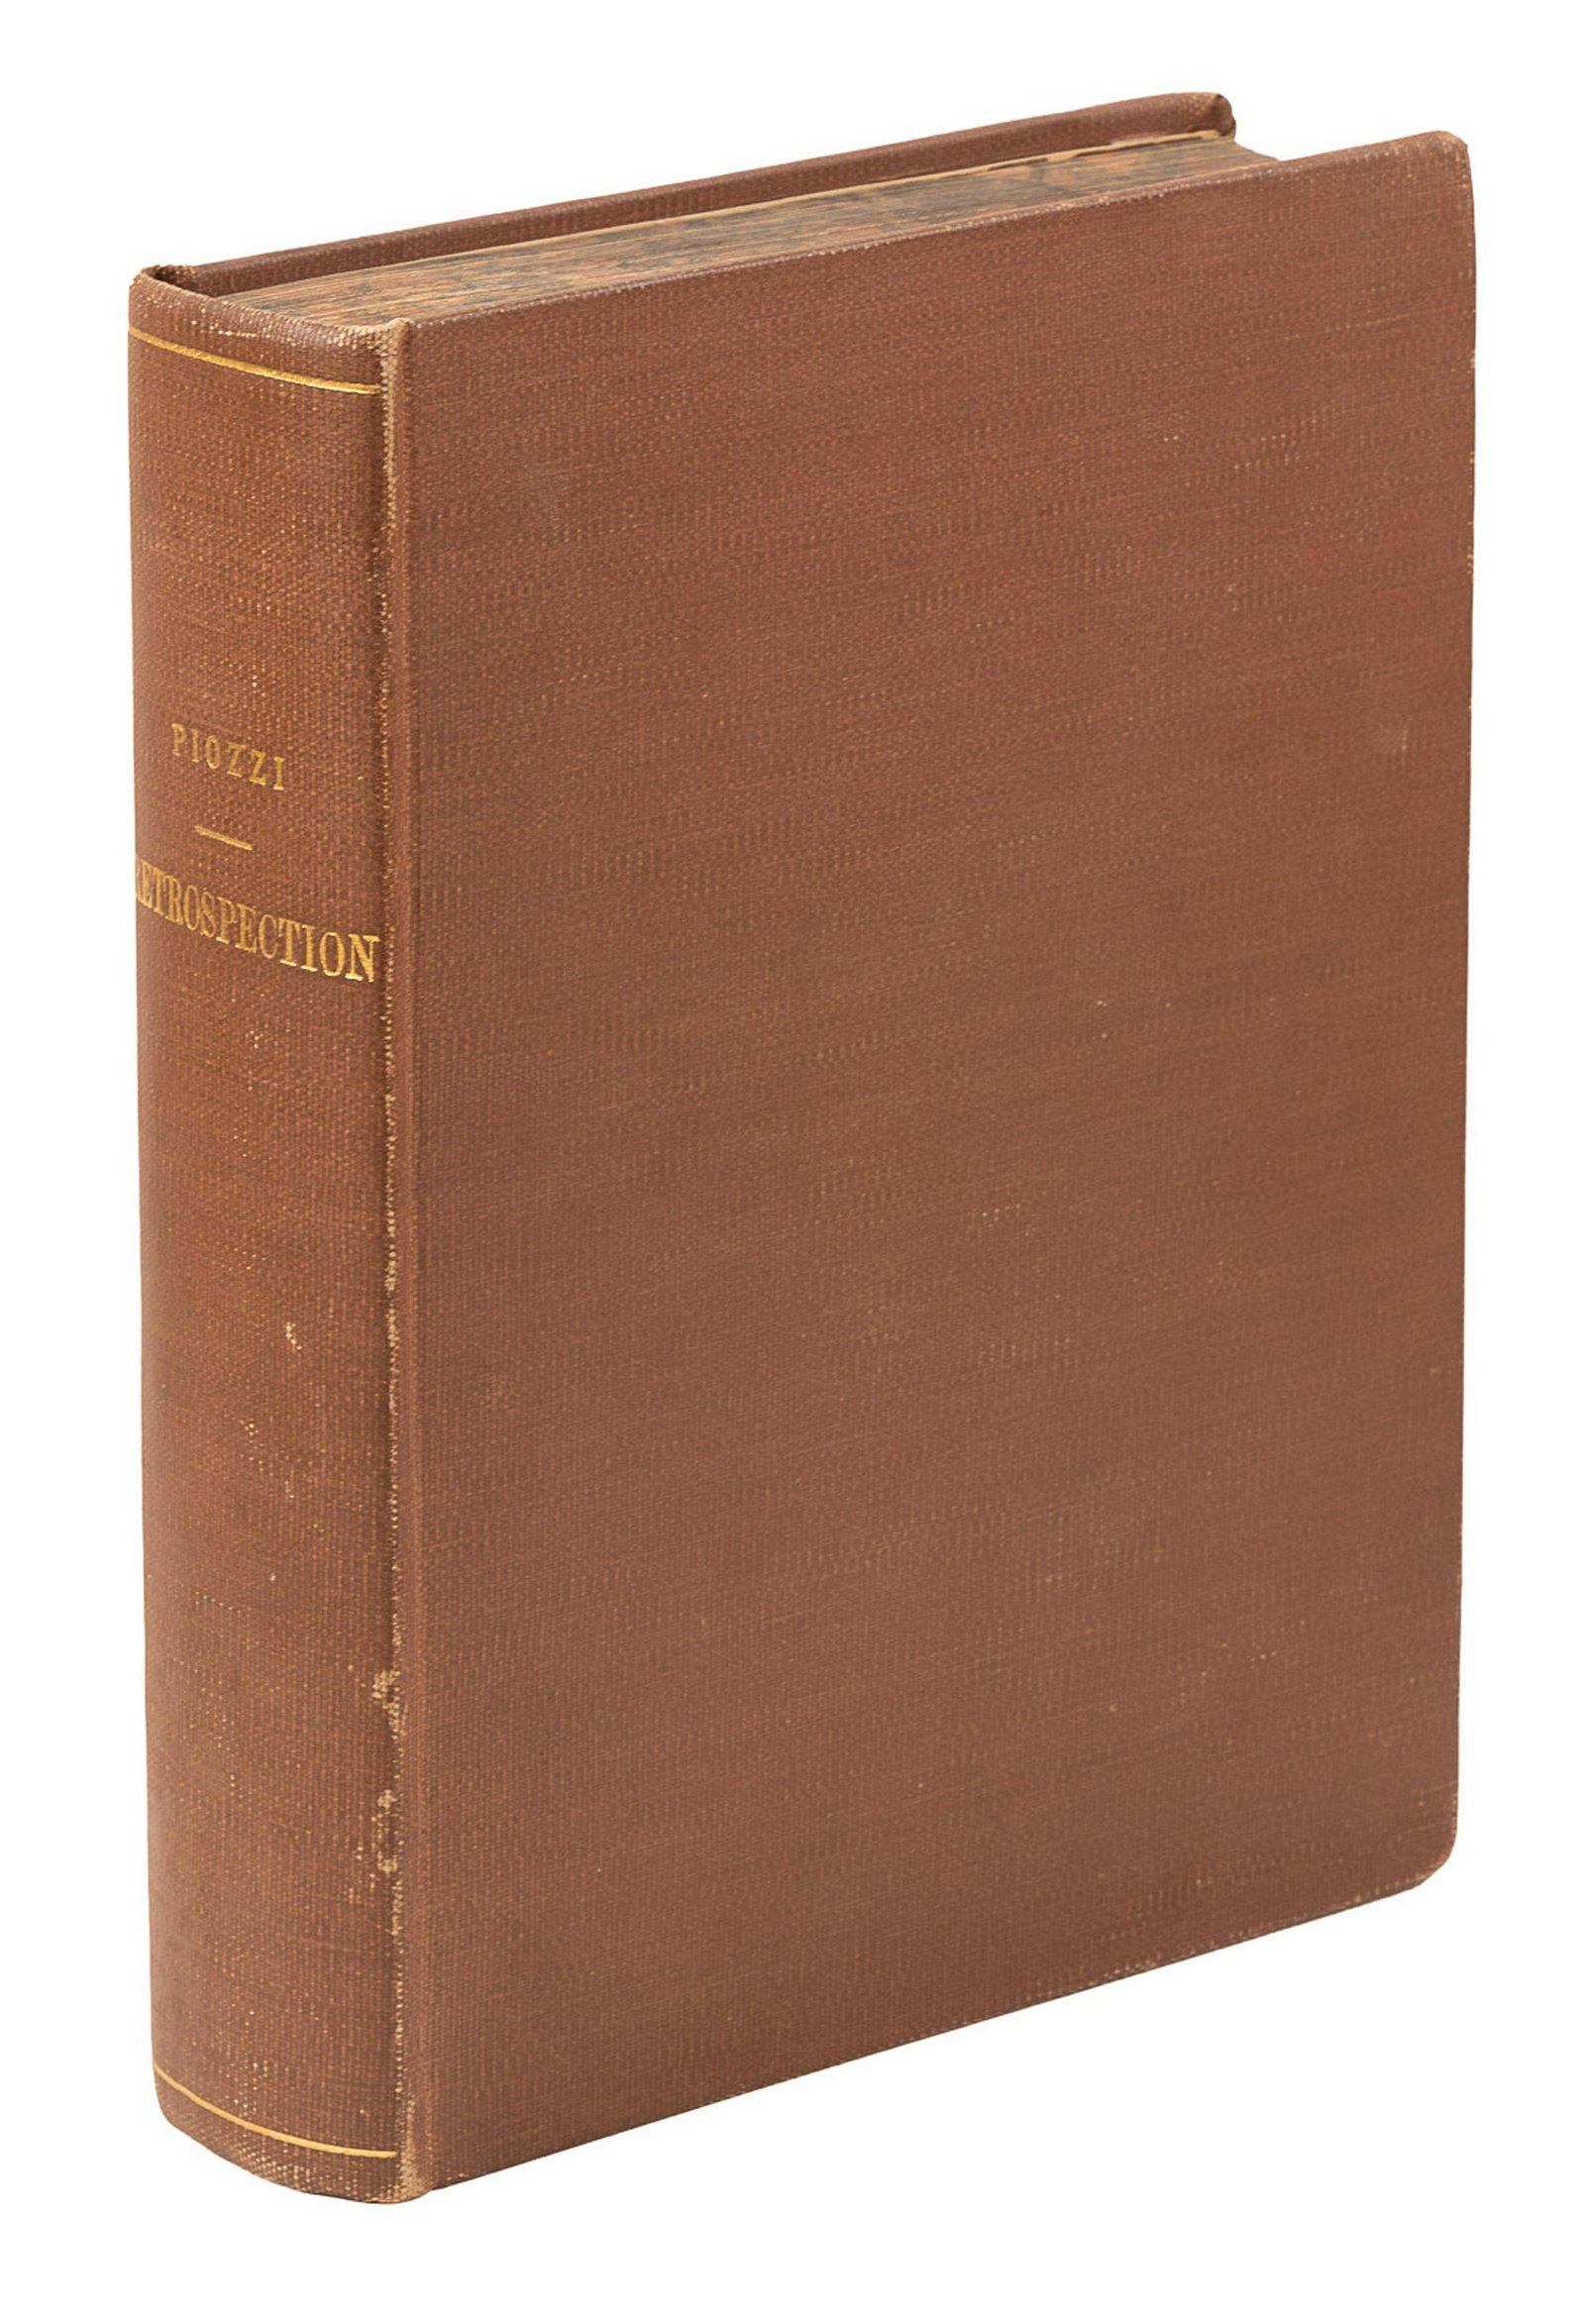 Hester Lynch Piozzi's Retrospection 1st ed.